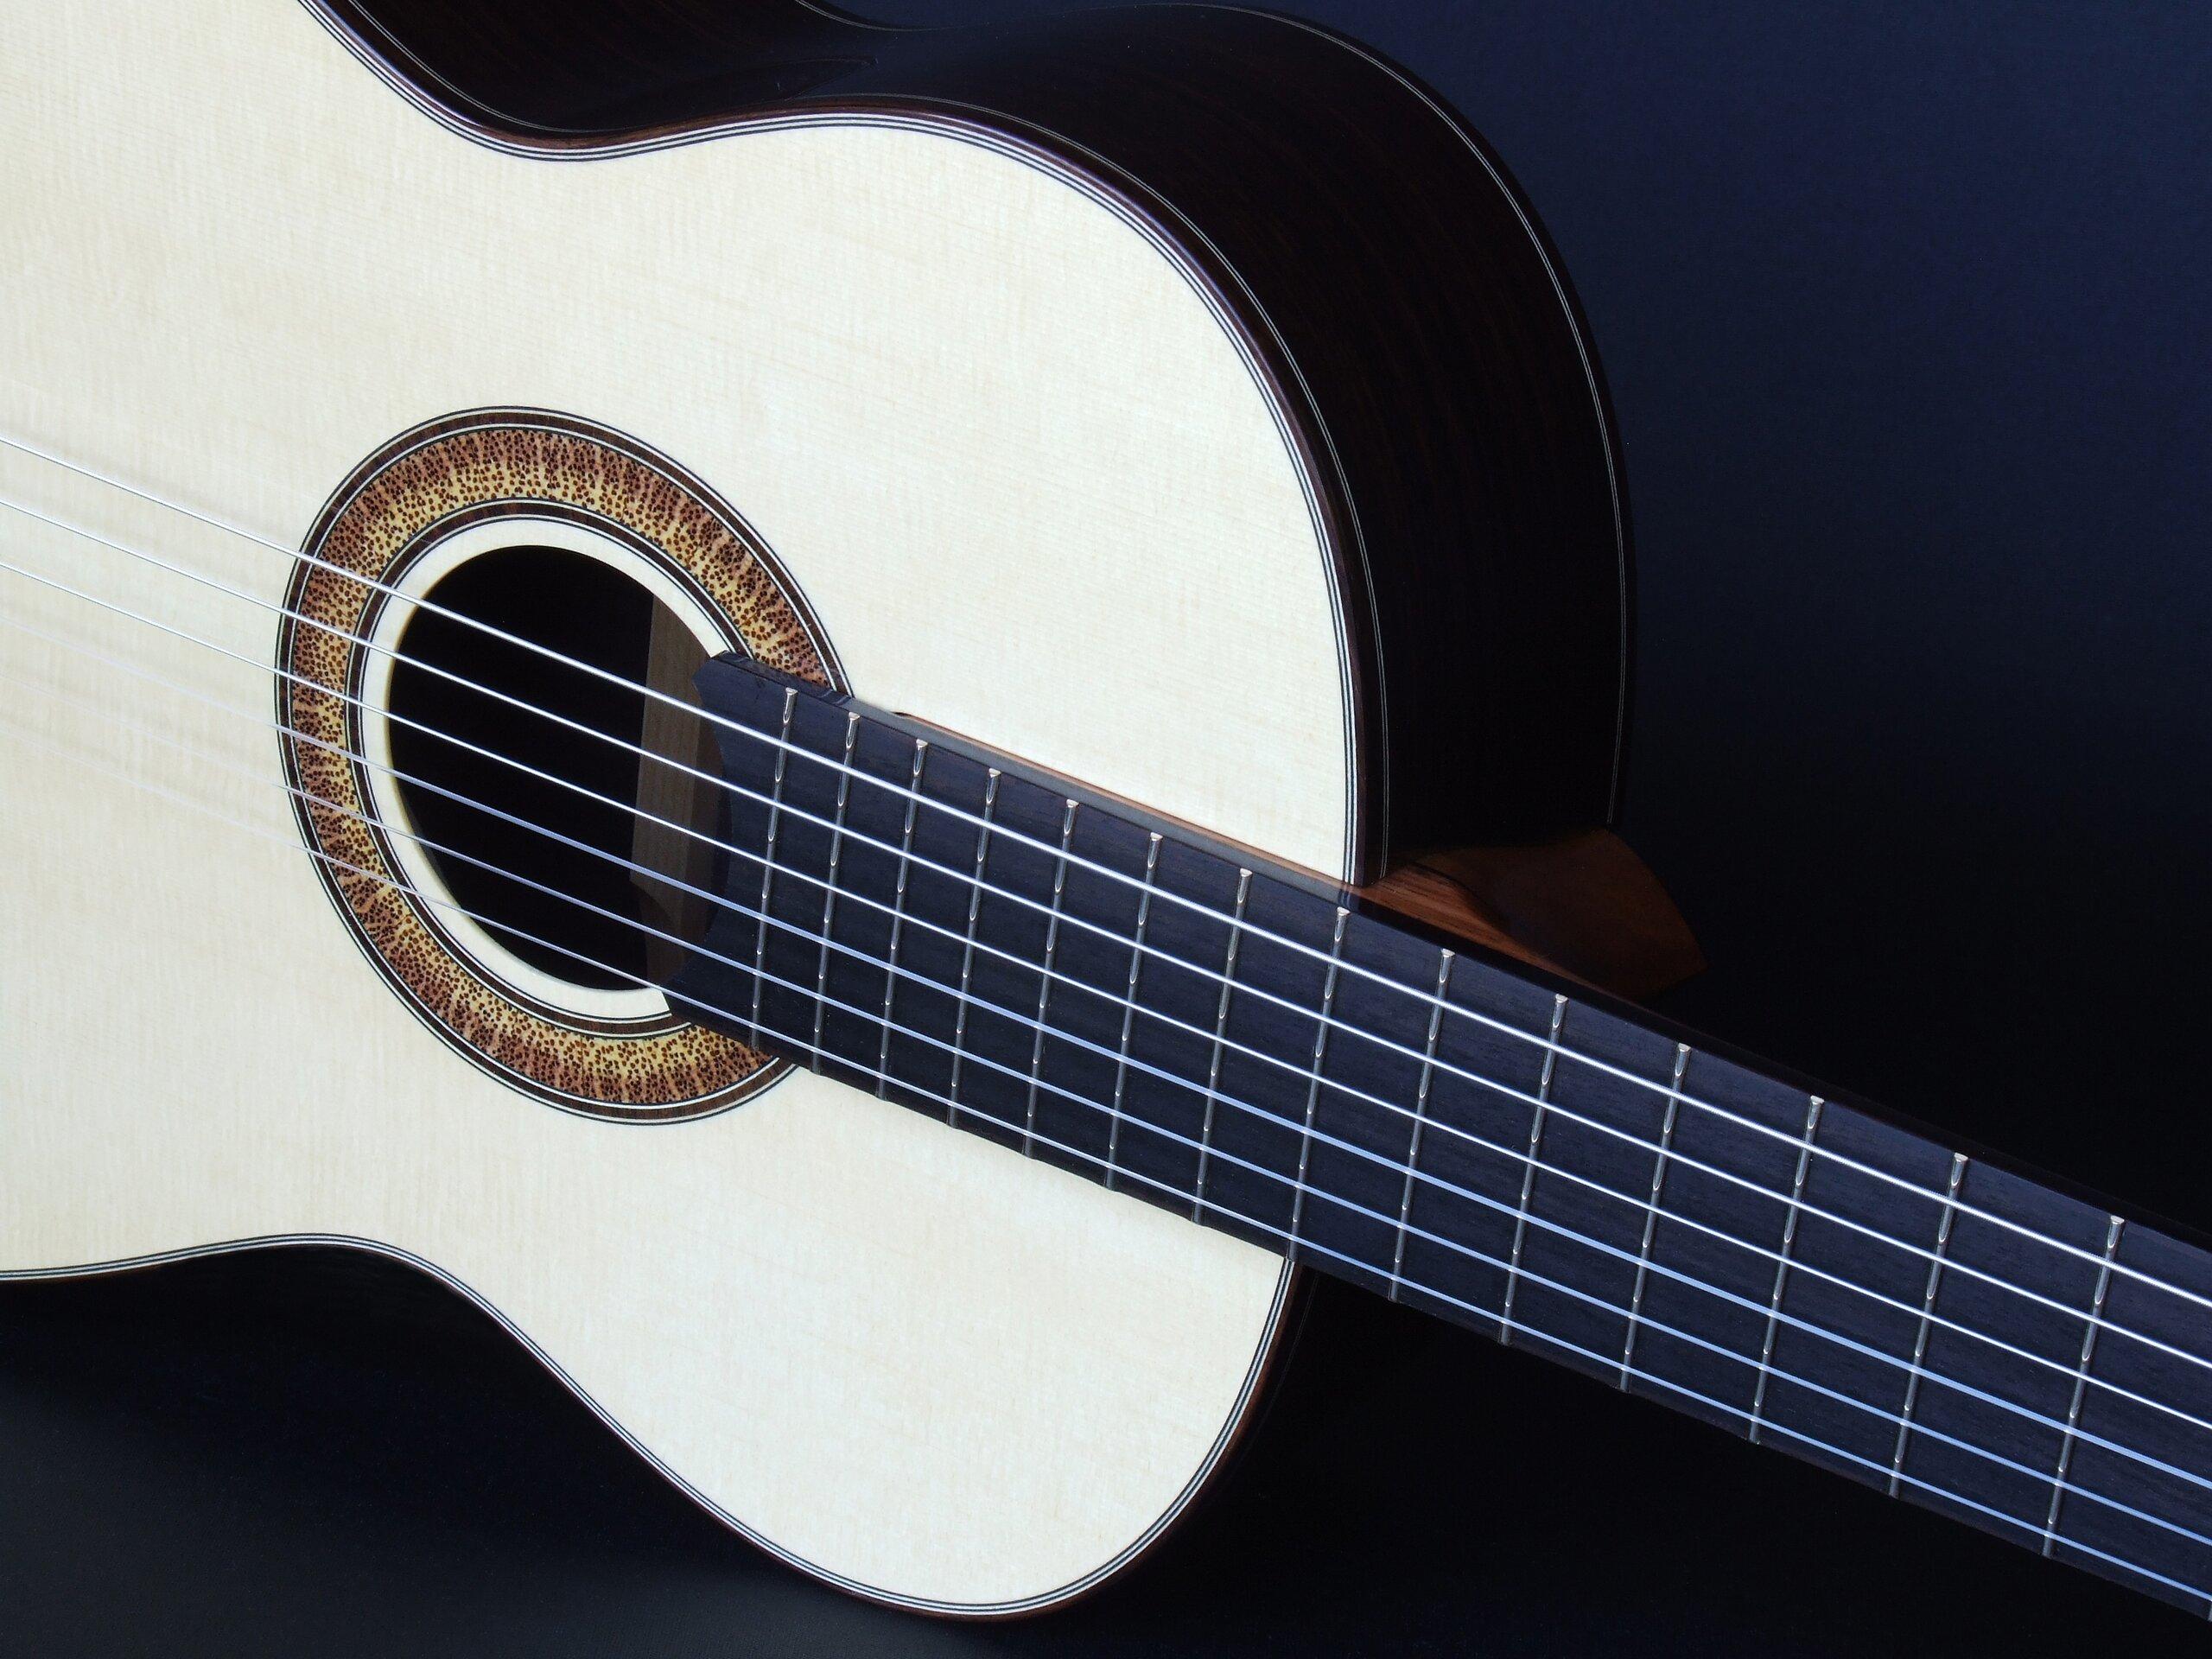 Natural sunburst rosette and ebony fretboard on a classical guitar